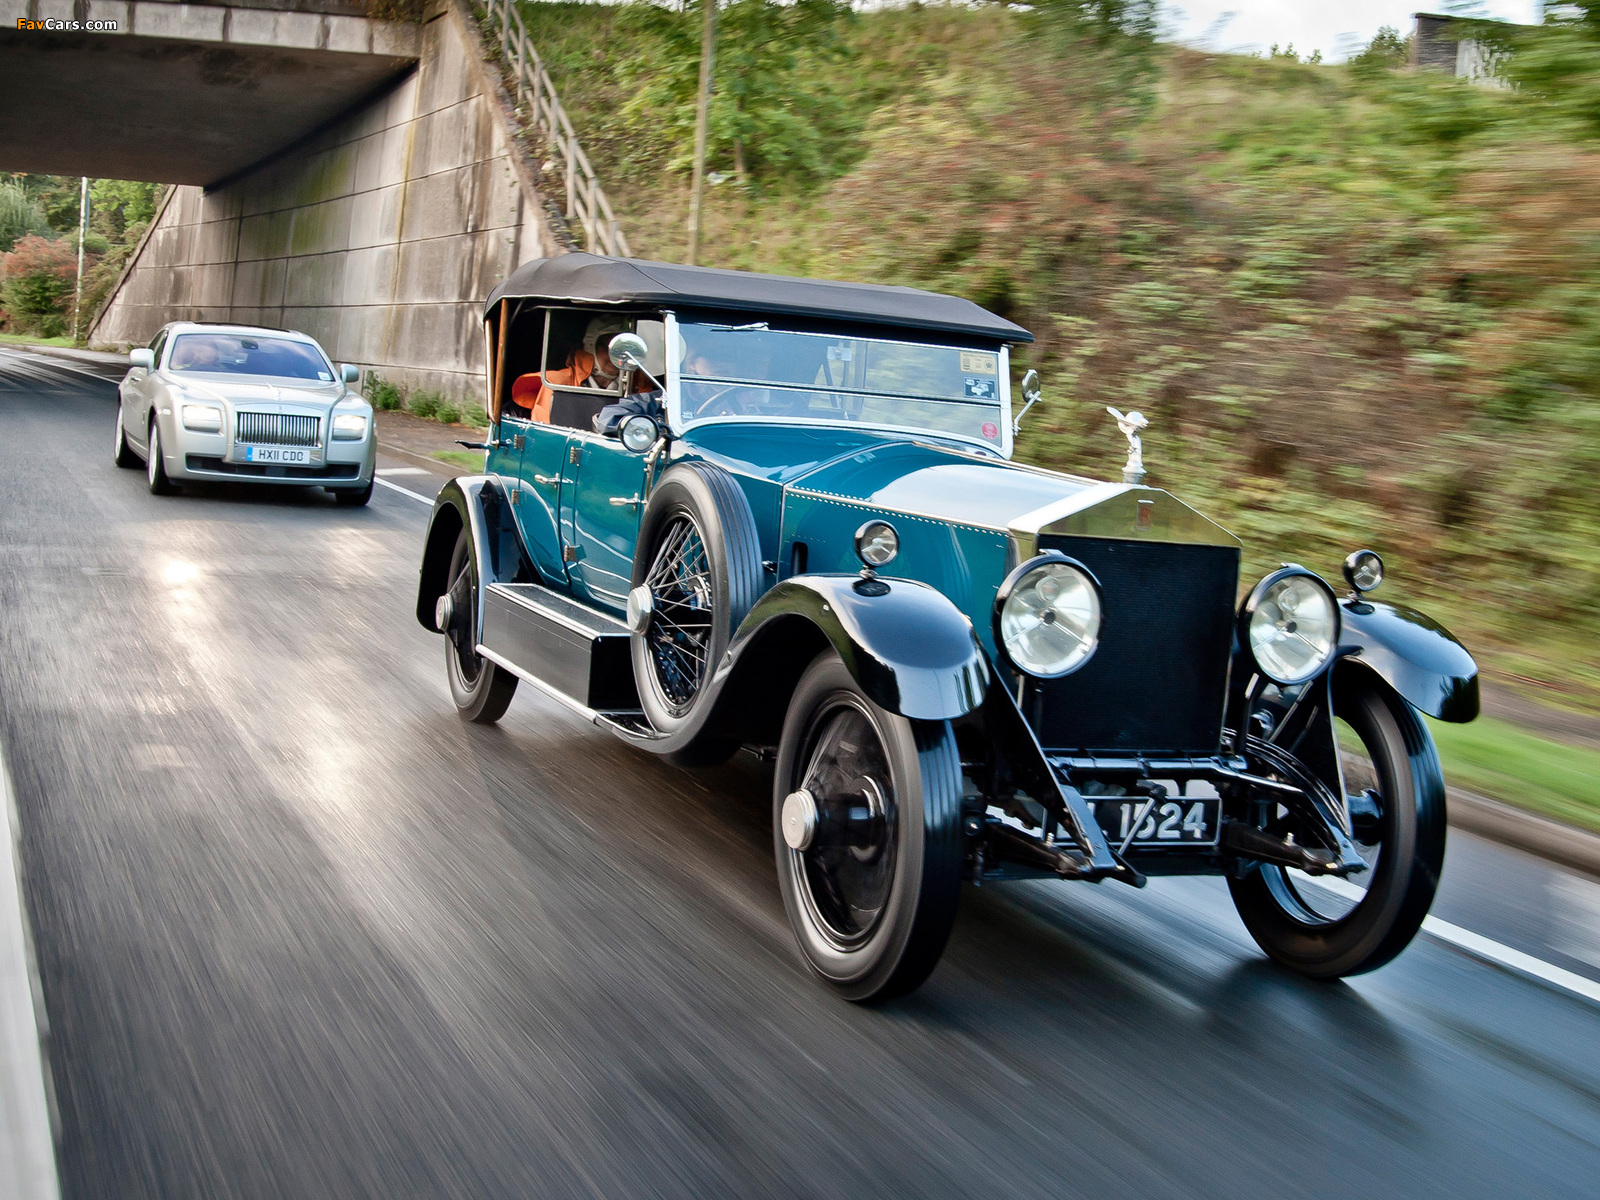 Pictures of Rolls-Royce (1600 x 1200)